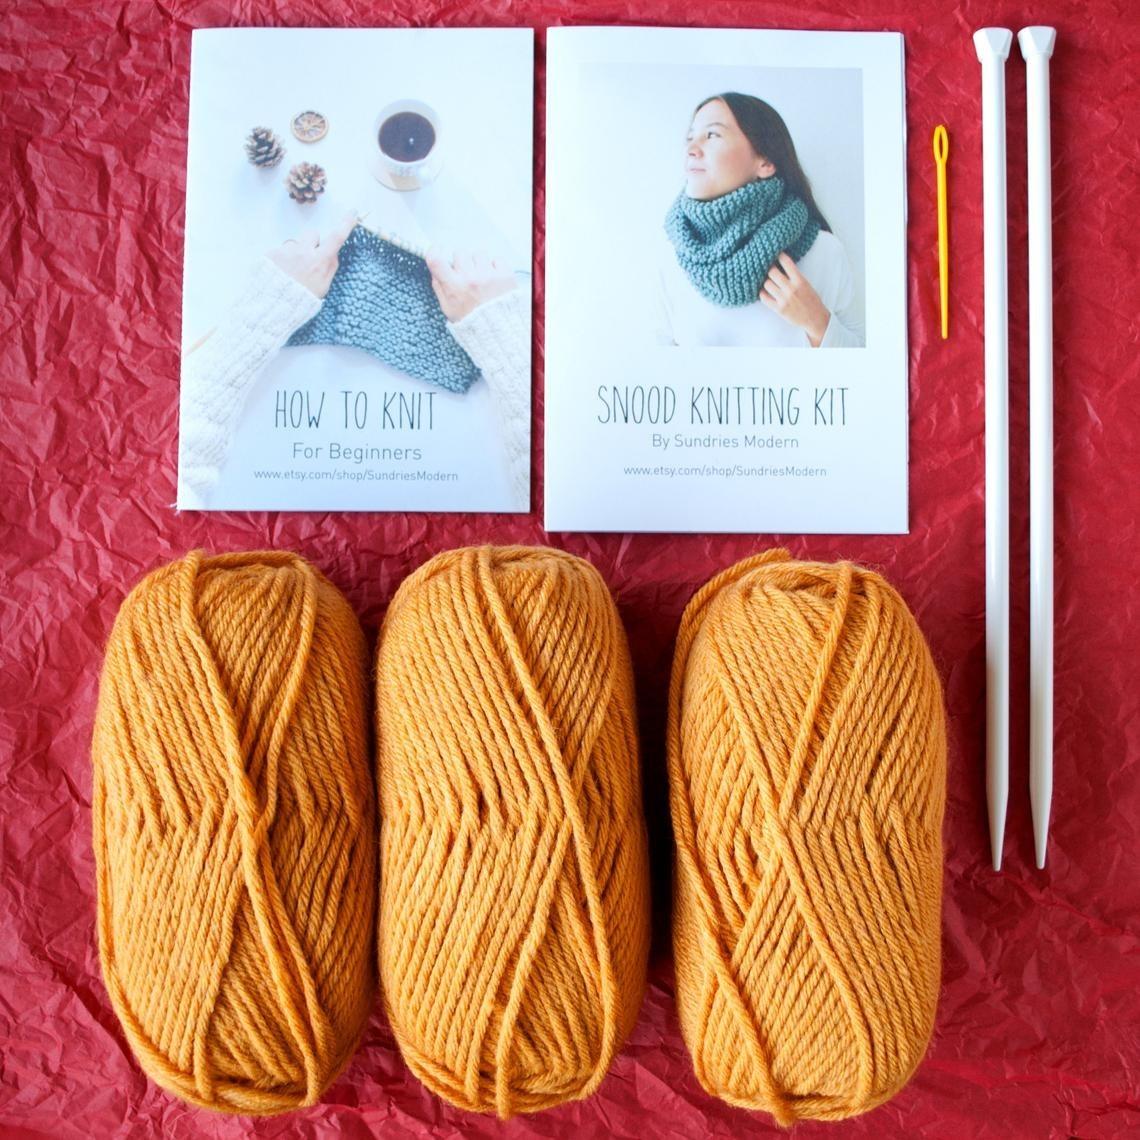 Three balls of yarn, knitting needles, and instructions